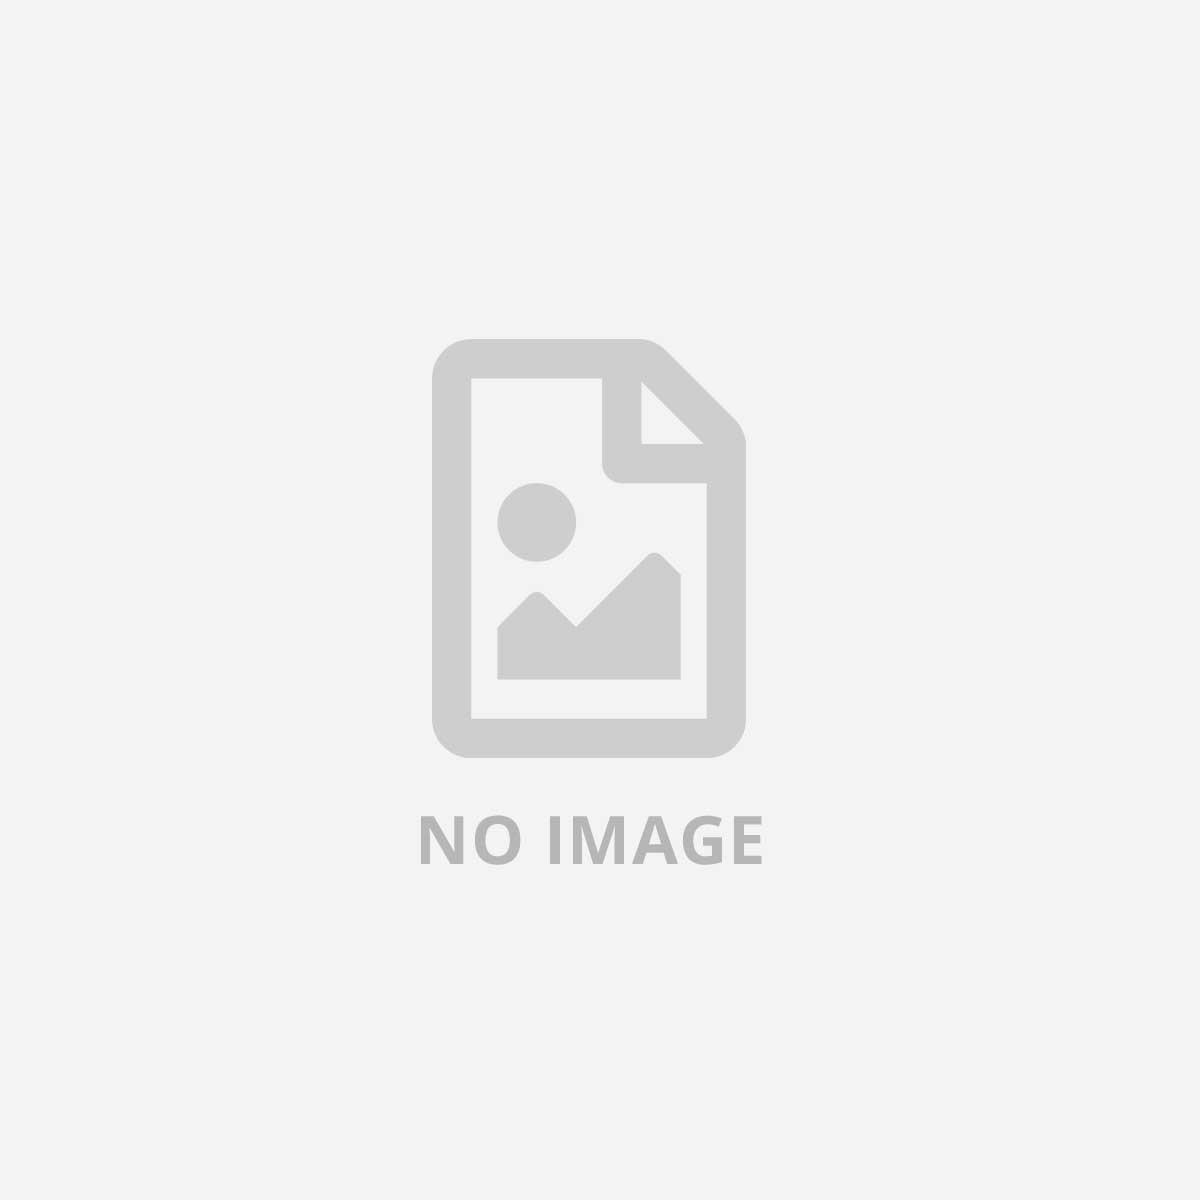 CORSAIR LL120 RGB WHITE FAN - 1X